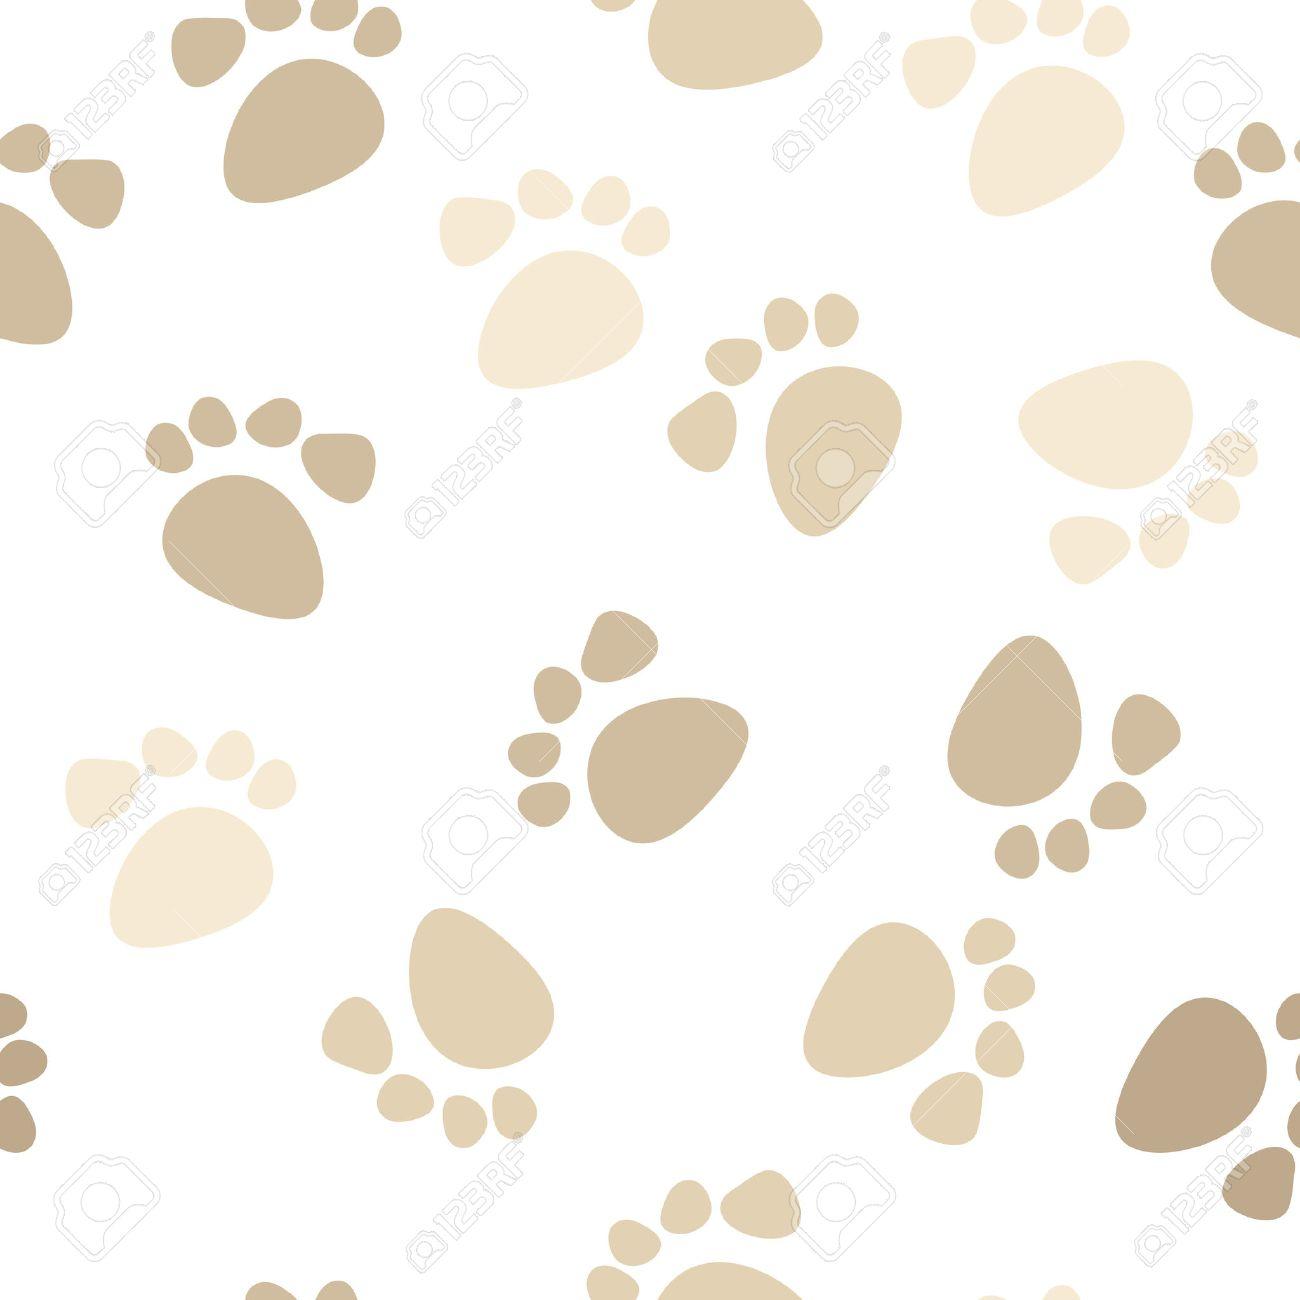 ~*Tallercito de Kiiara95*~ - Página 2 4949007-seamless-footprint-wallpaper-dog-paw-background